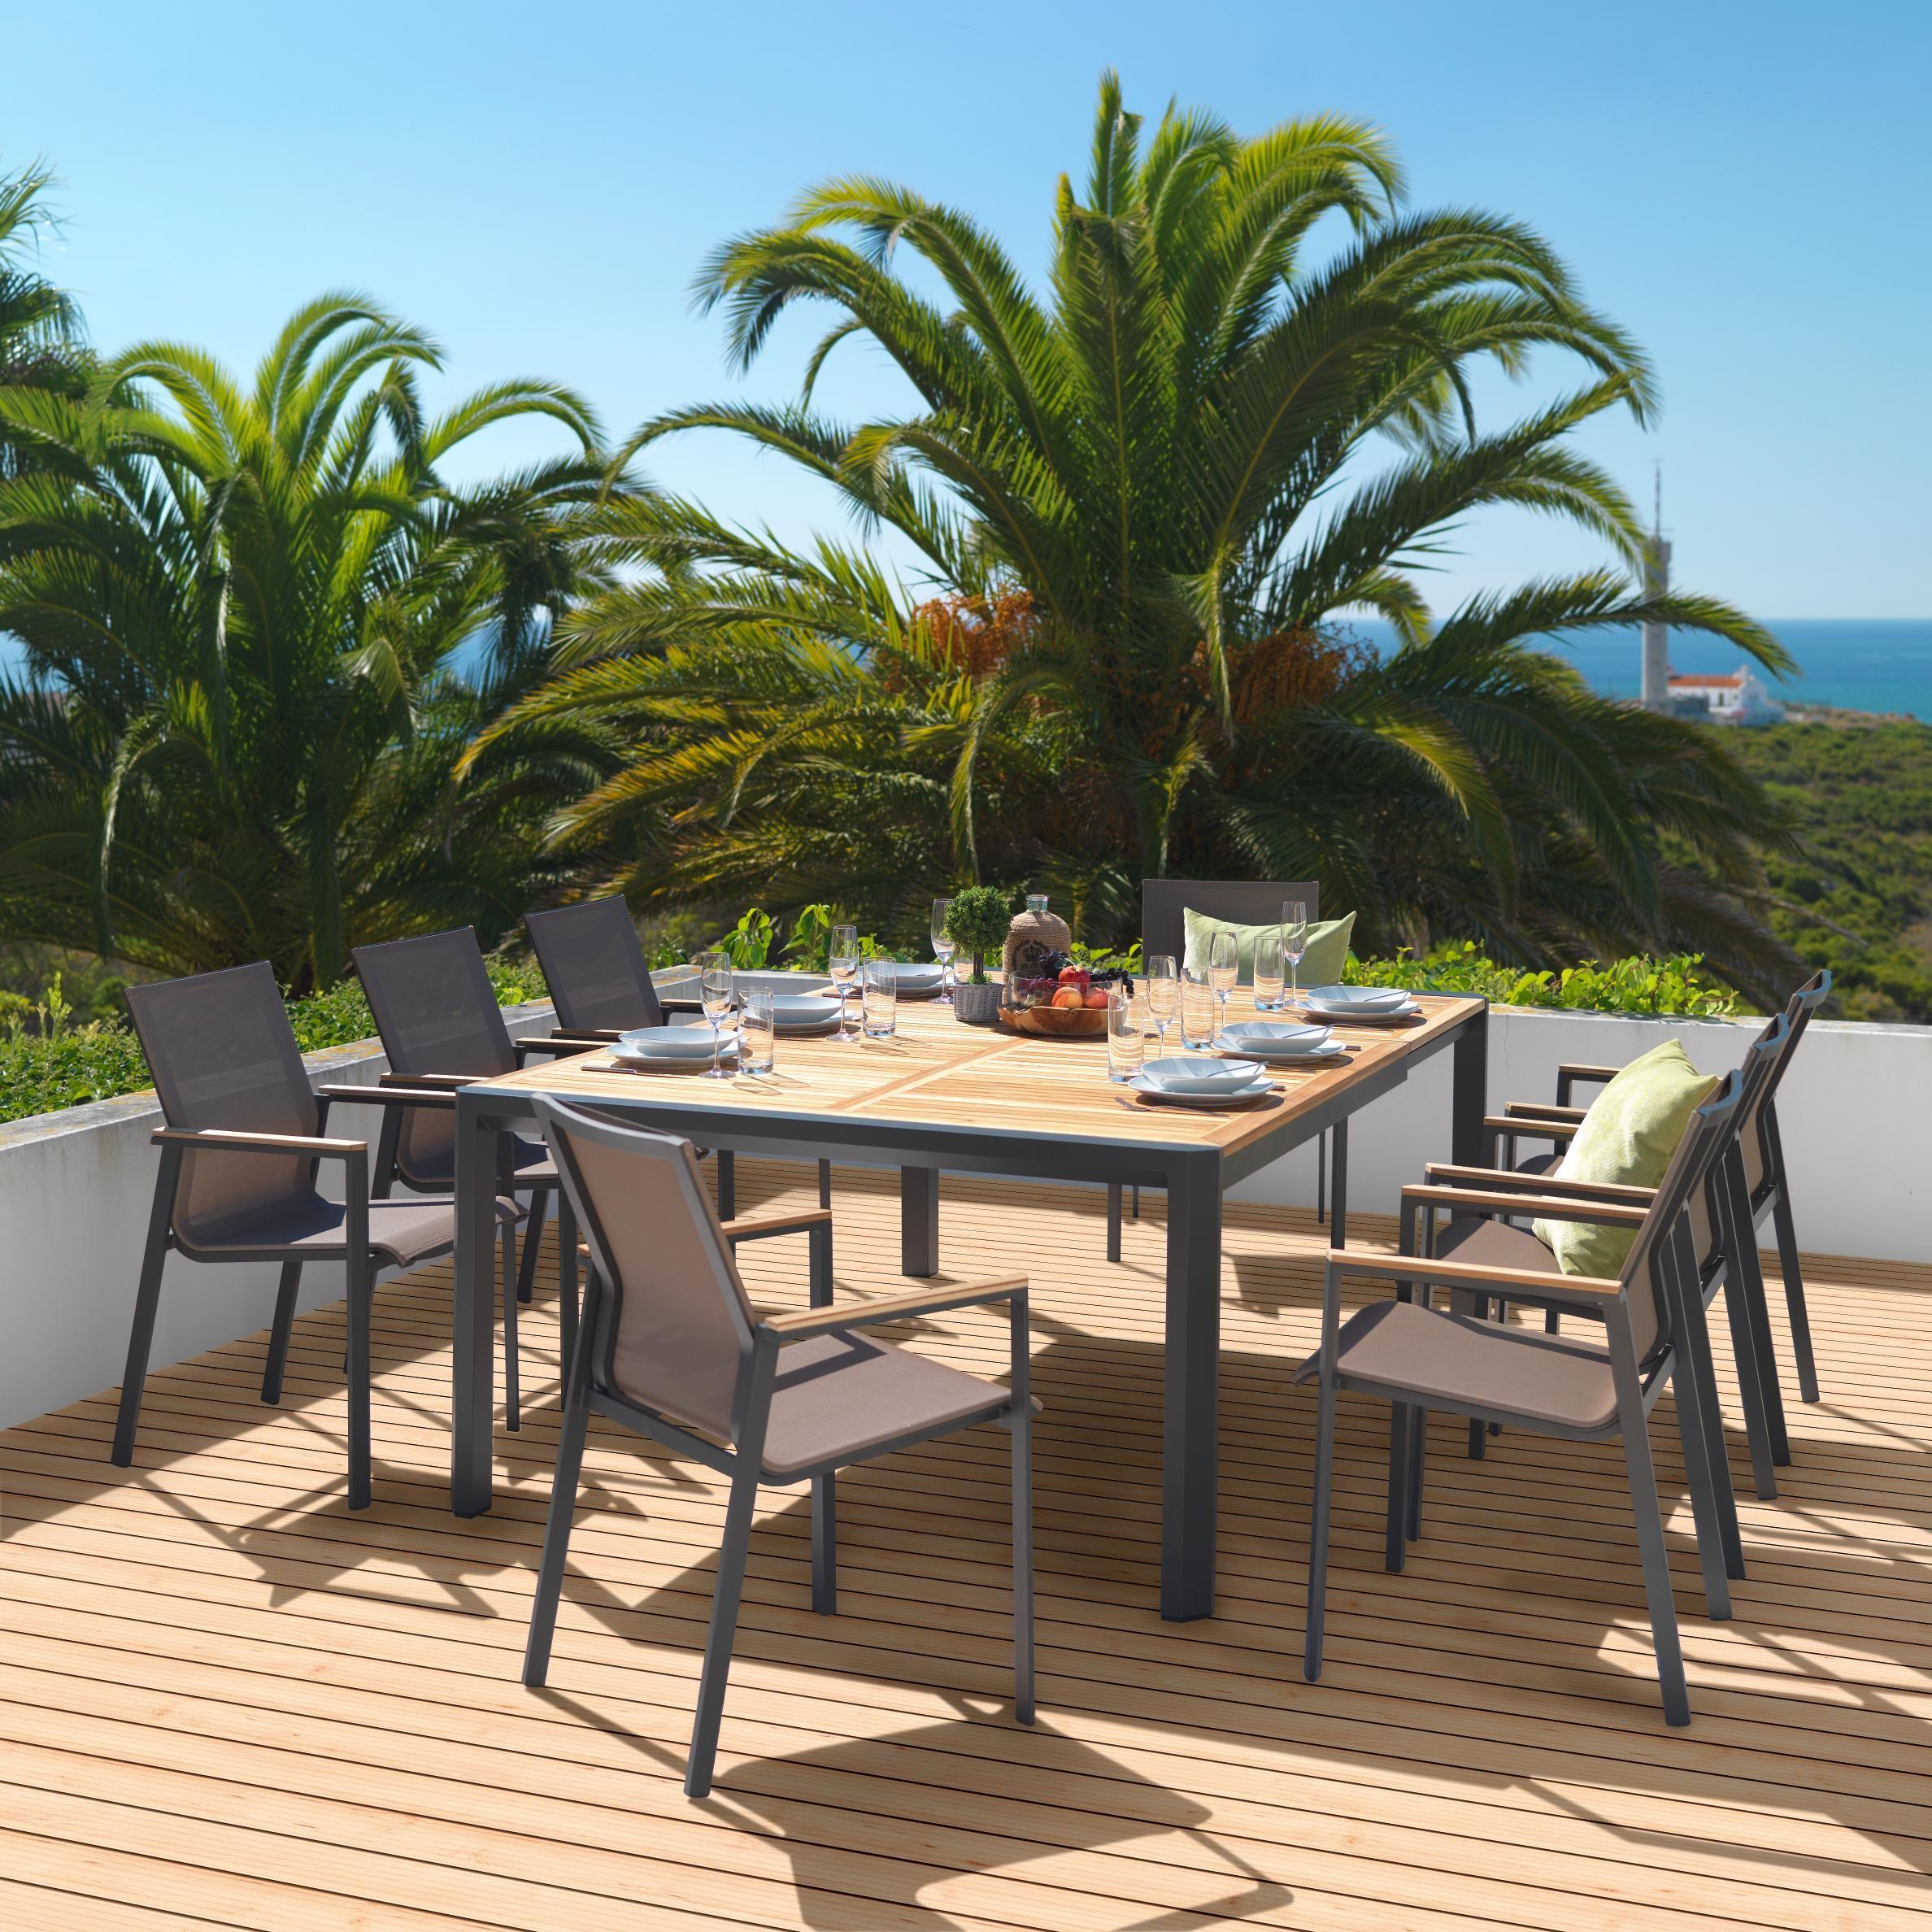 Moderne Sitzgruppe Fur Den Garten Grillpartys Im Freien Geniessen Garten Gartendesign Ideen Gartenmobel